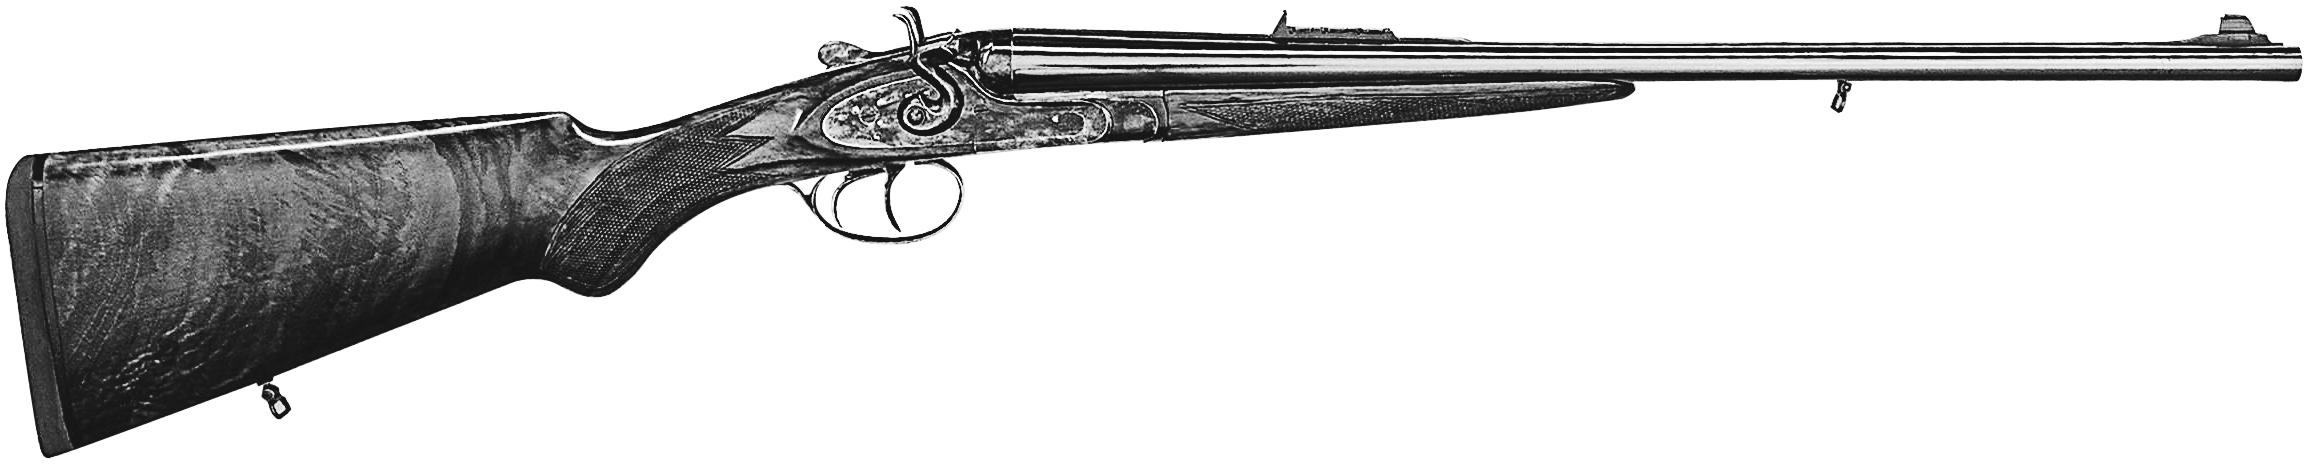 Kodiak Mark IV Express Rifle